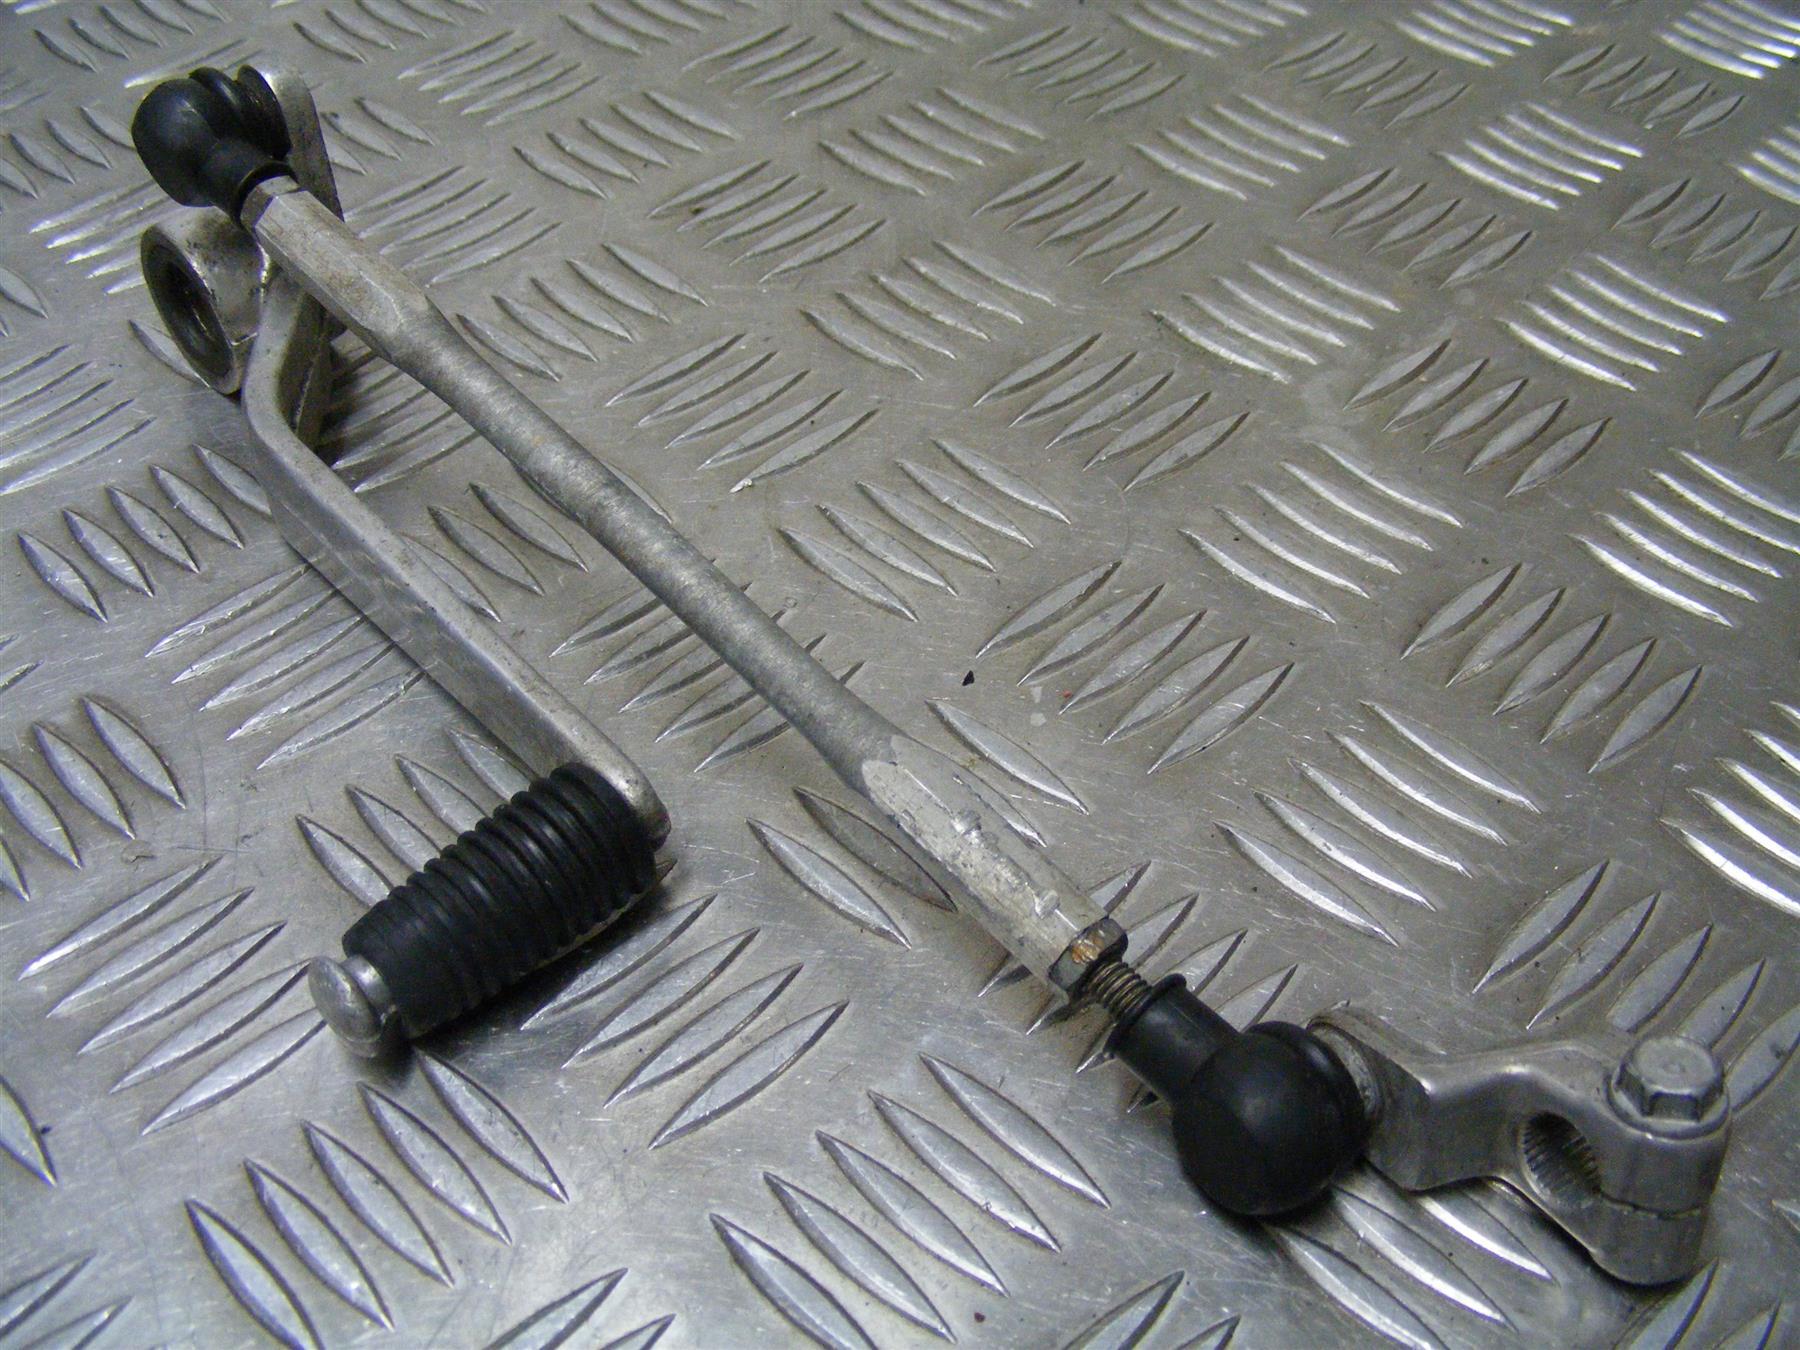 Zx6r Rear Brake Hose Genuine Kawasaki 2000-2001 841 for sale online